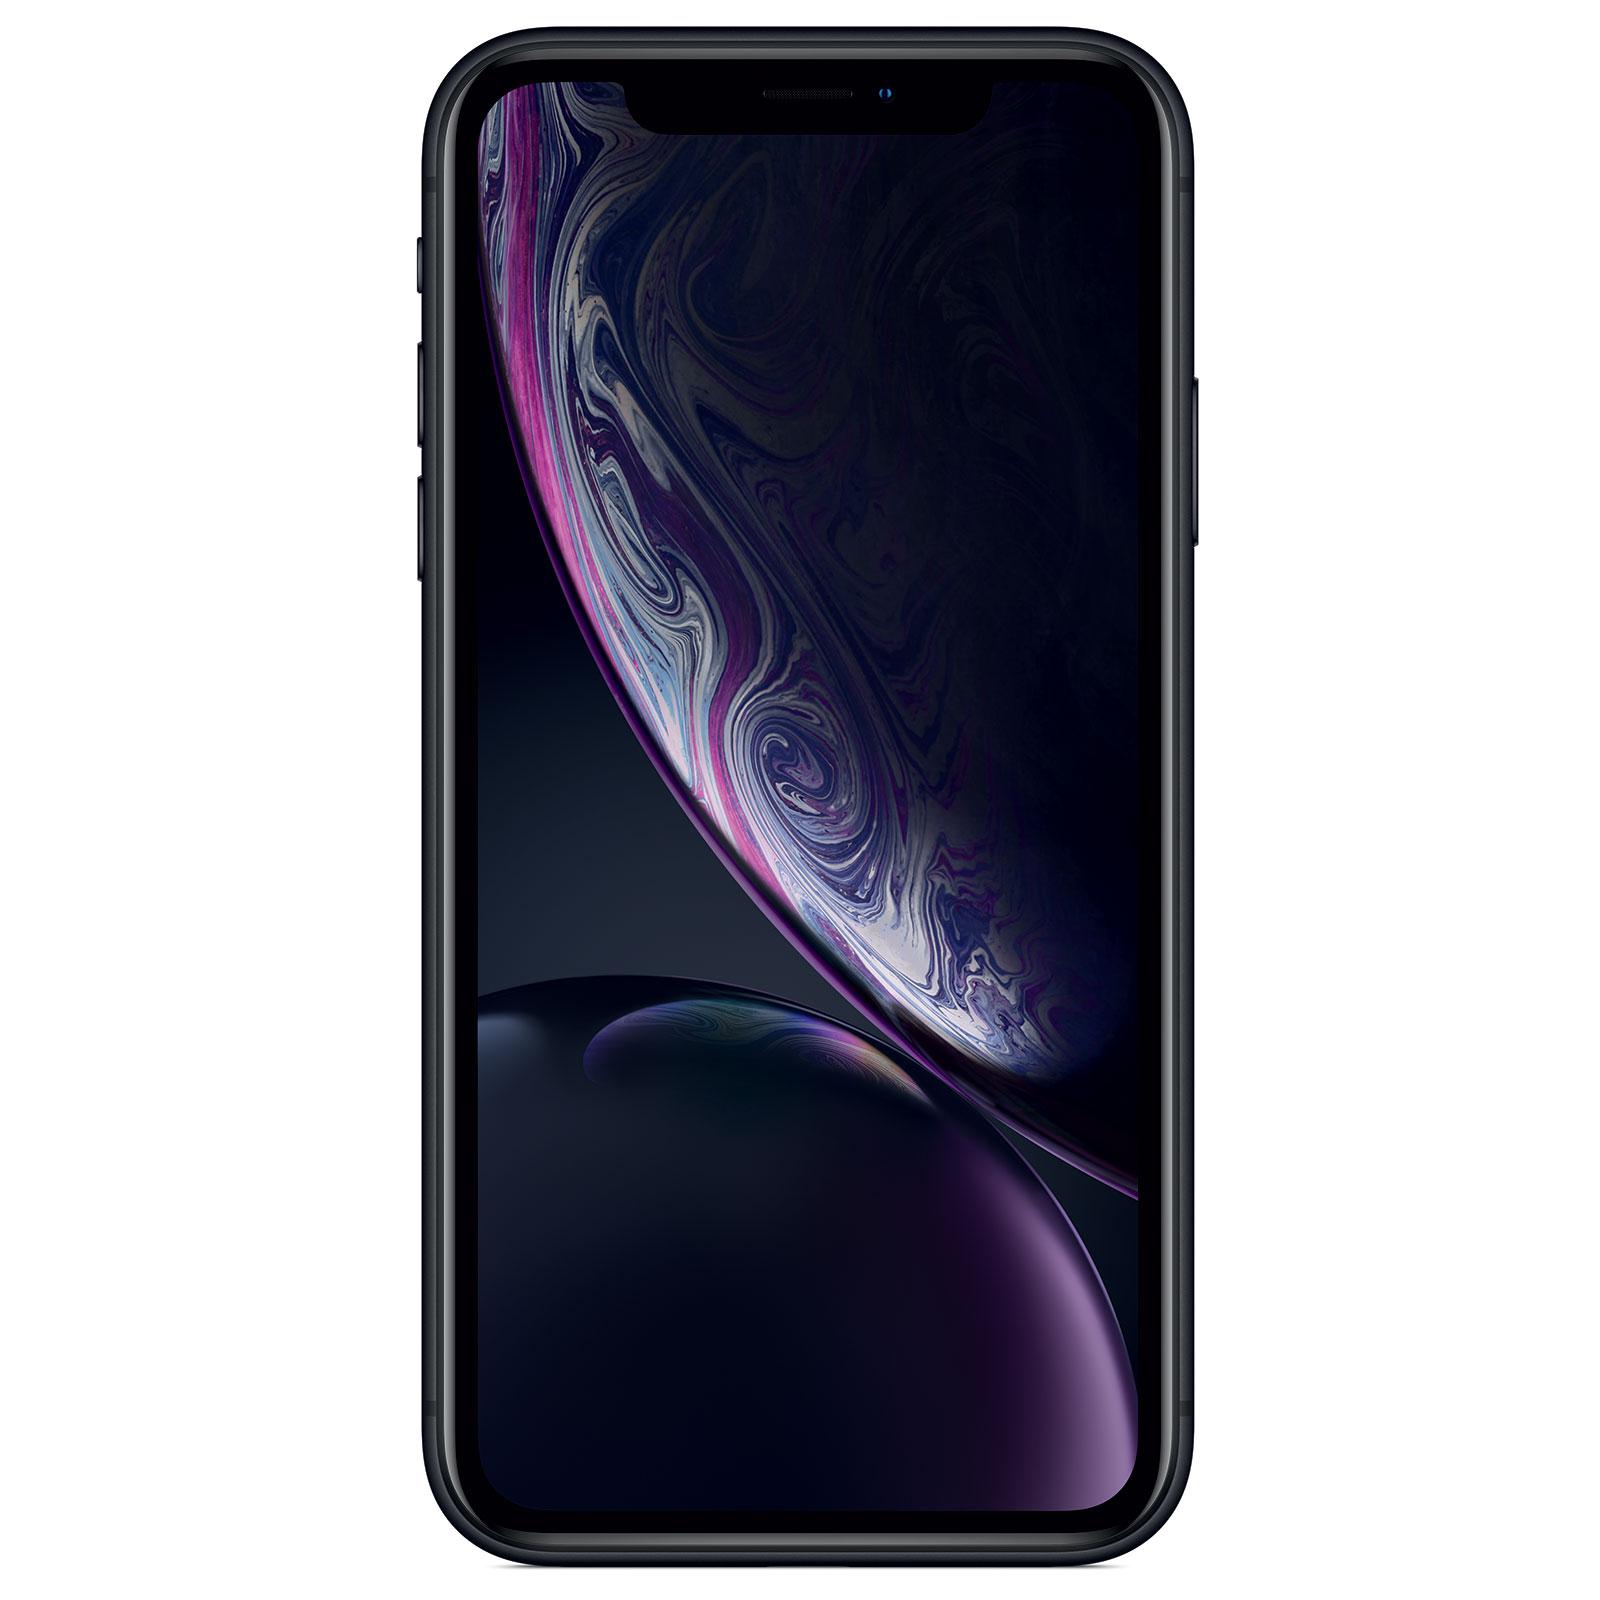 "Mobile & smartphone Apple iPhone XR 128 Go Noir Smartphone 4G-LTE Advanced IP67 Dual SIM - Apple A12 Bionic Hexa-Core - RAM 3 Go - Ecran 6.1"" 828 x 1792 - 128 Go - NFC/Bluetooth 5.0 - iOS 12"